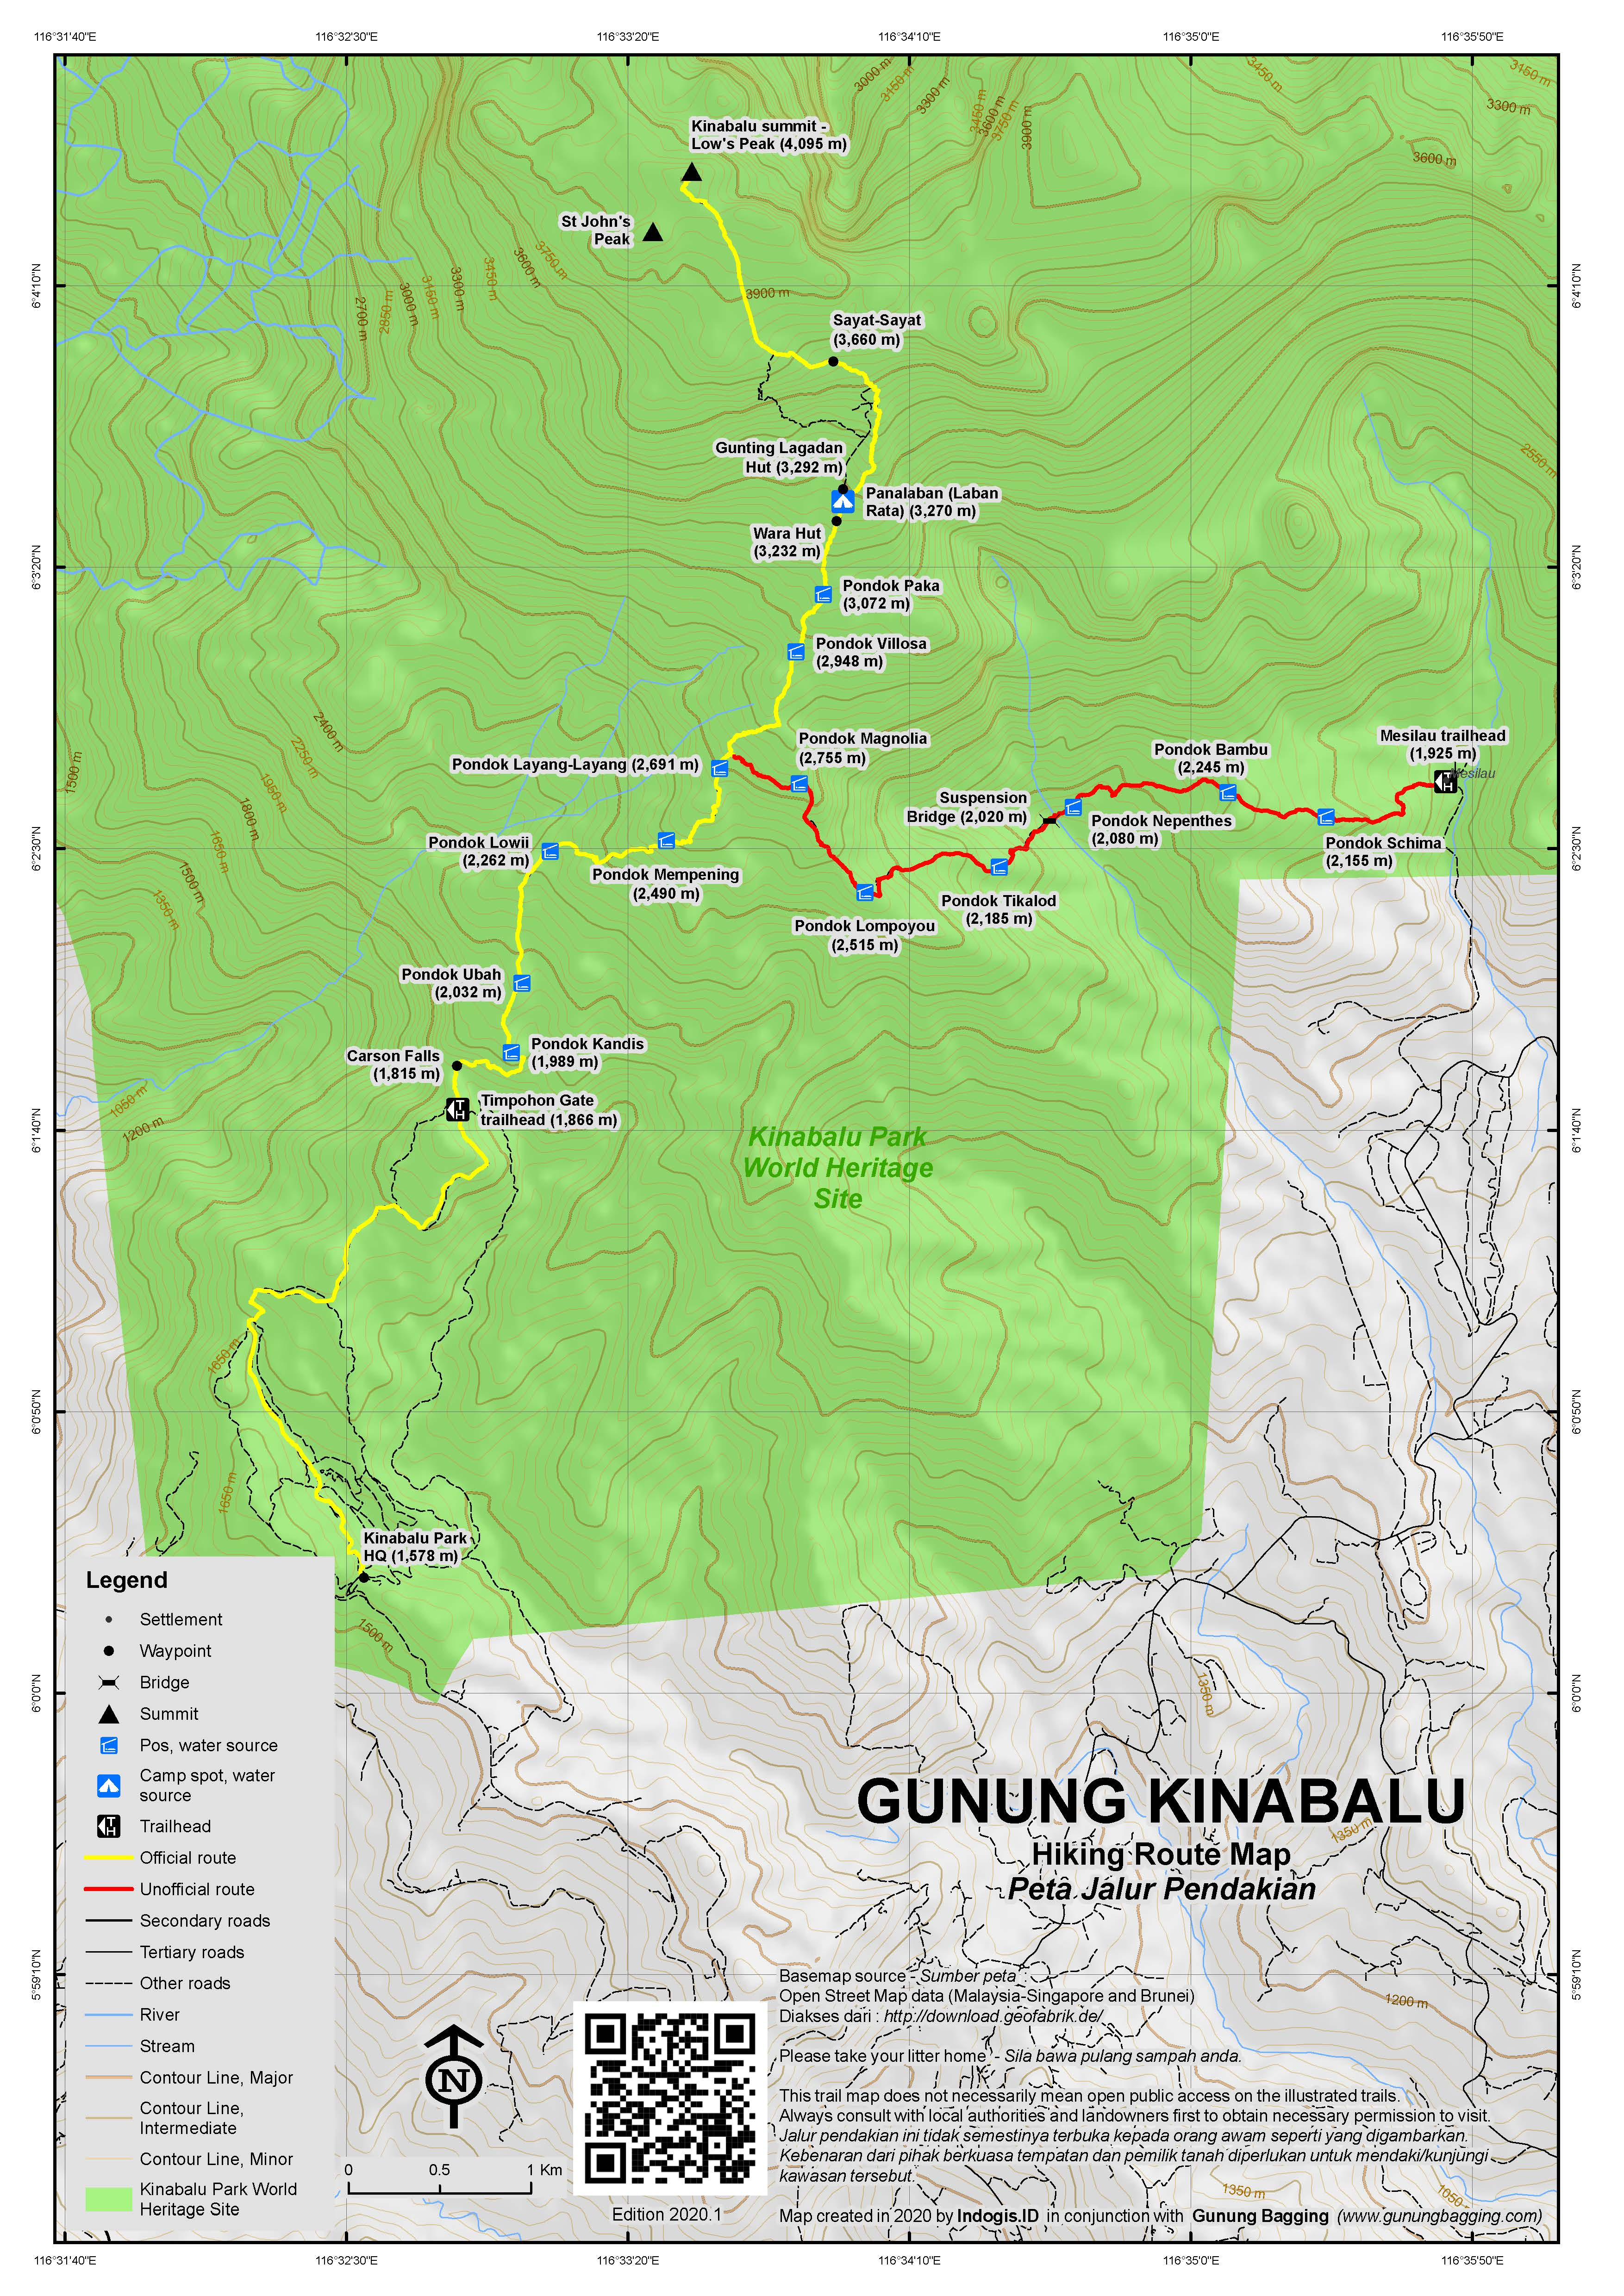 Peta Jalur Pendakian Gunung Kinabalu